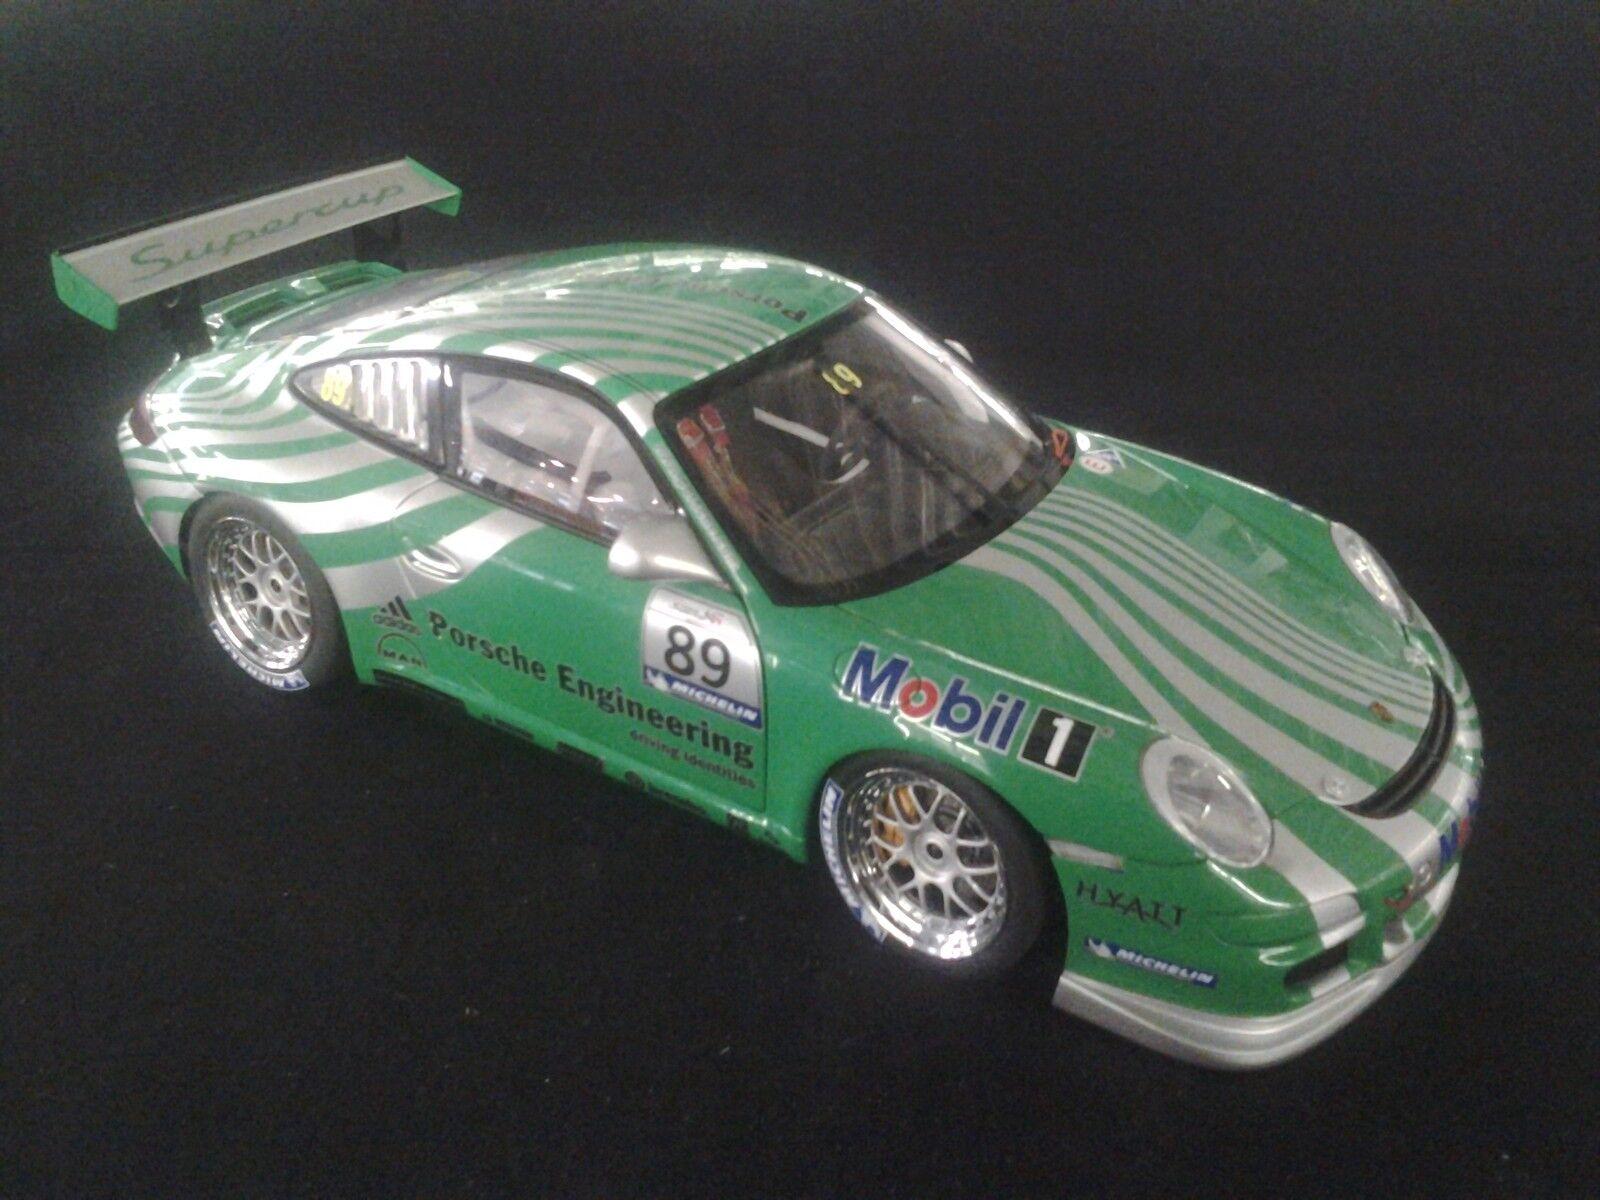 AutoArt Porsche 911 (997) GT3 Cup 2006 1 18  89 VIP Car (MCC)